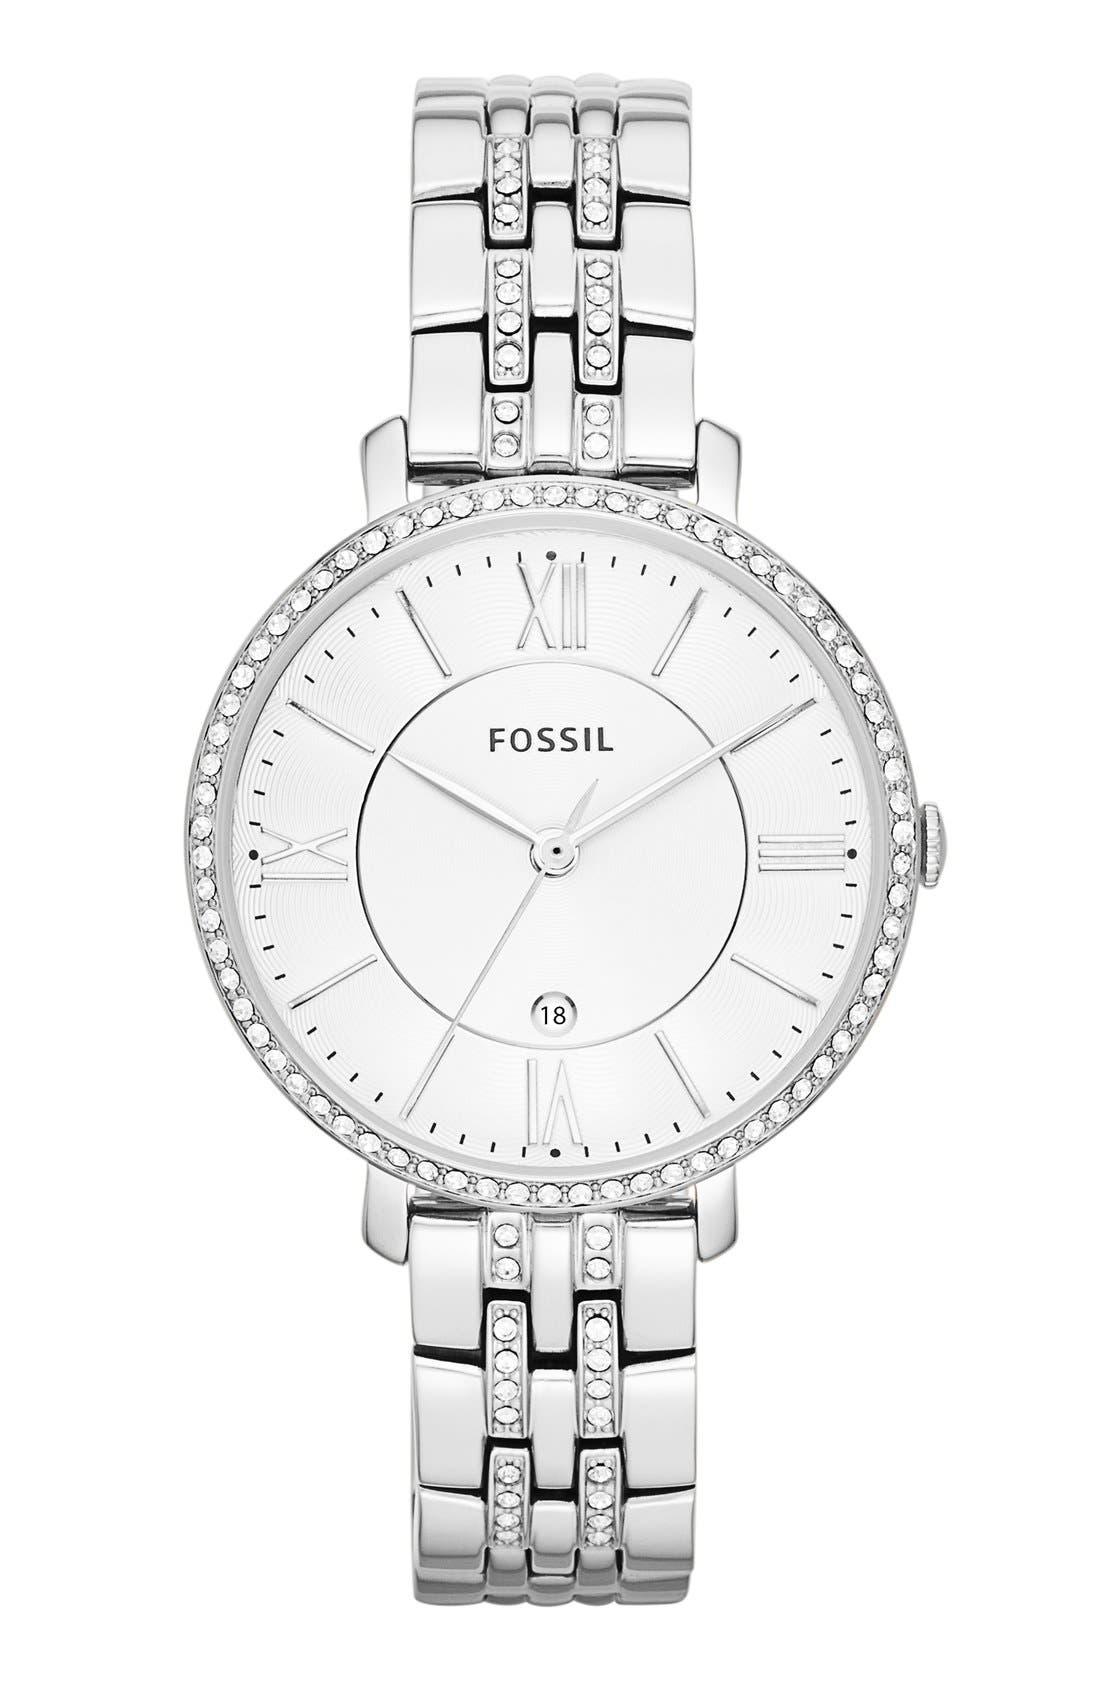 FOSSIL 'Jacqueline' Crystal Bezel Bracelet Watch, 36mm, Main, color, SILVER